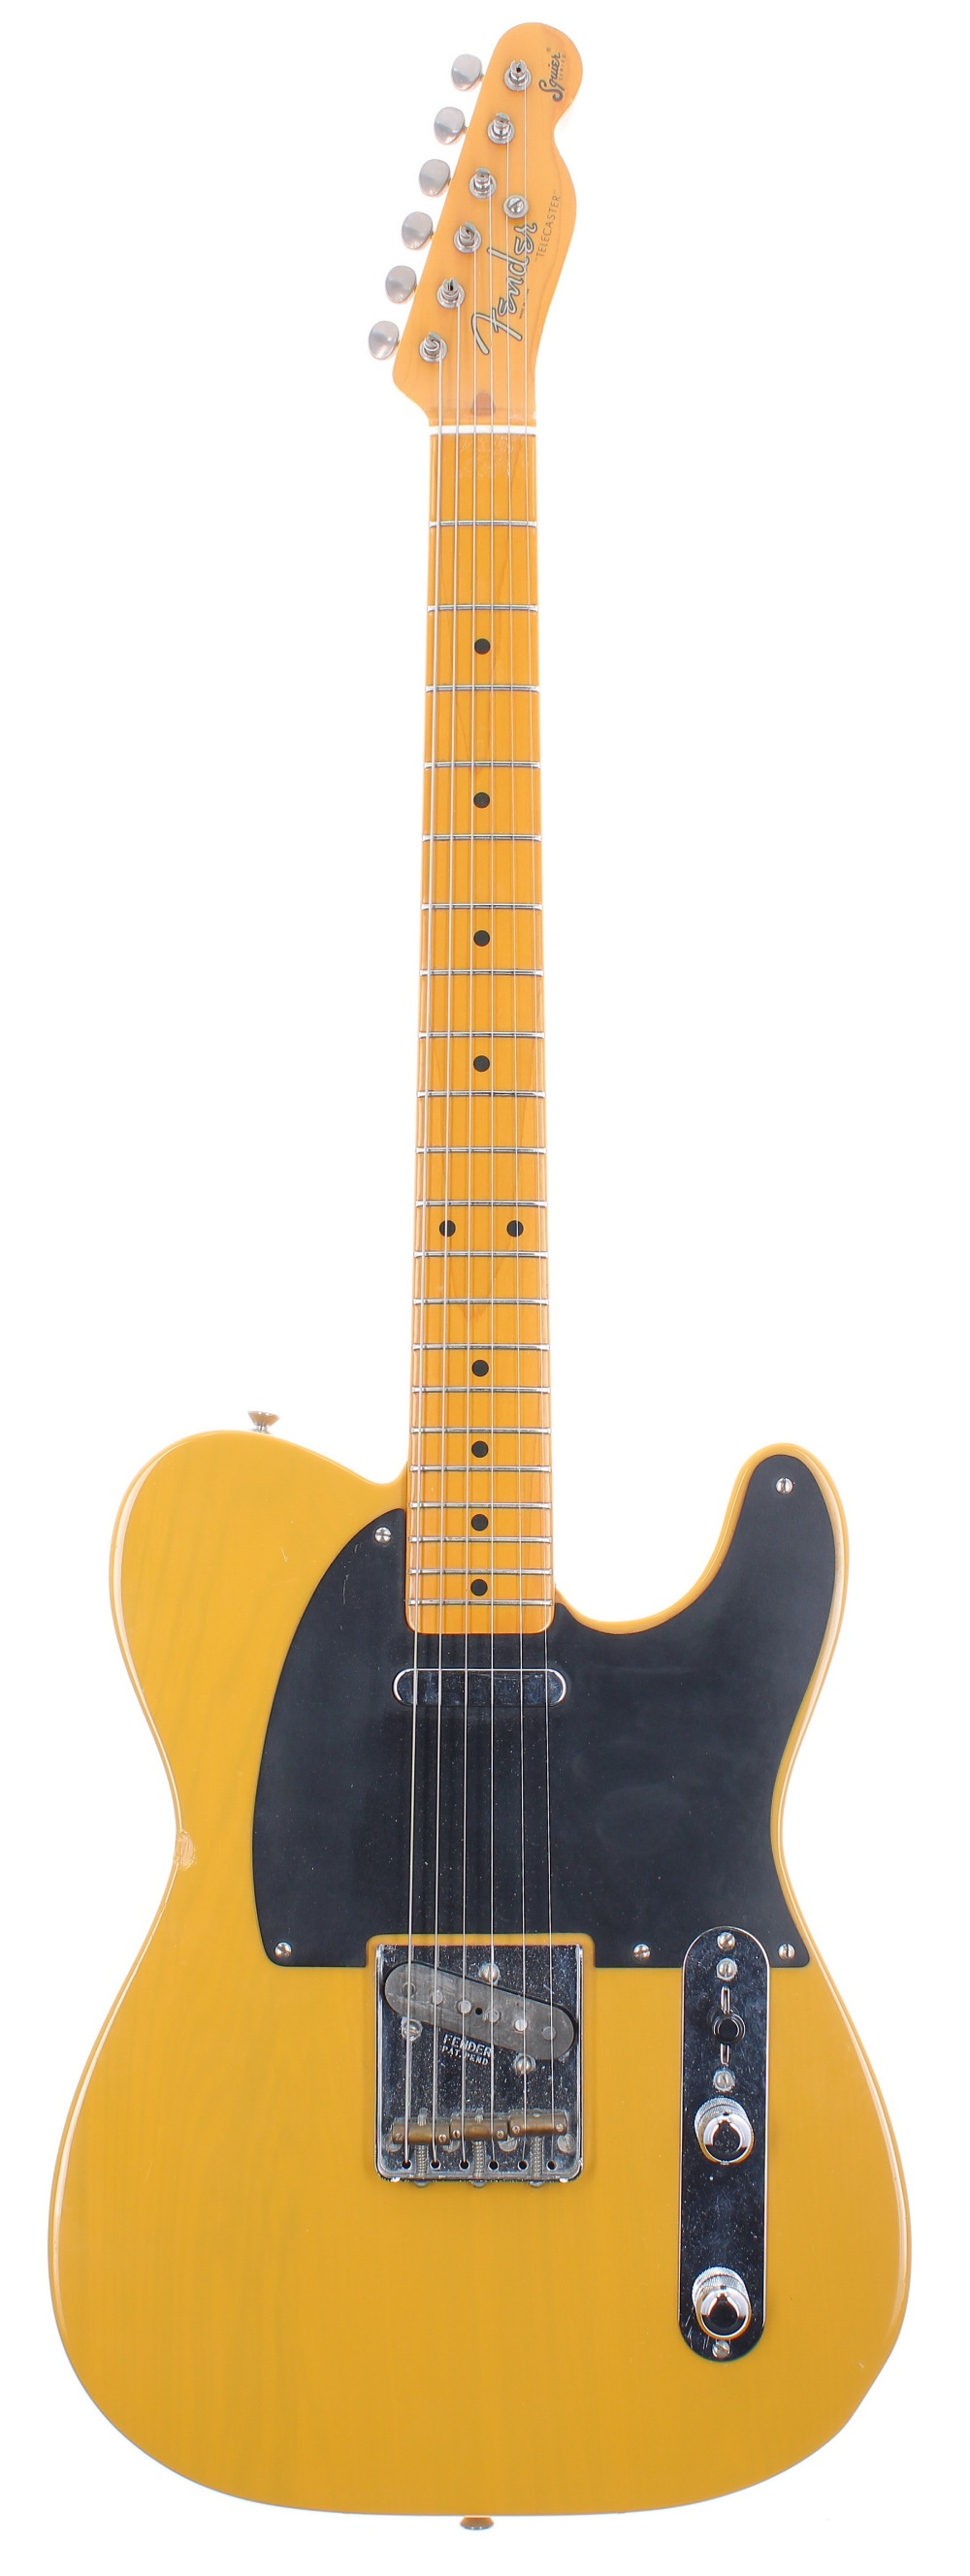 1982 Fender Squier Series '52 Telecaster electric guitar, made in Japan, ser. no. JVxxxx4; Finish: